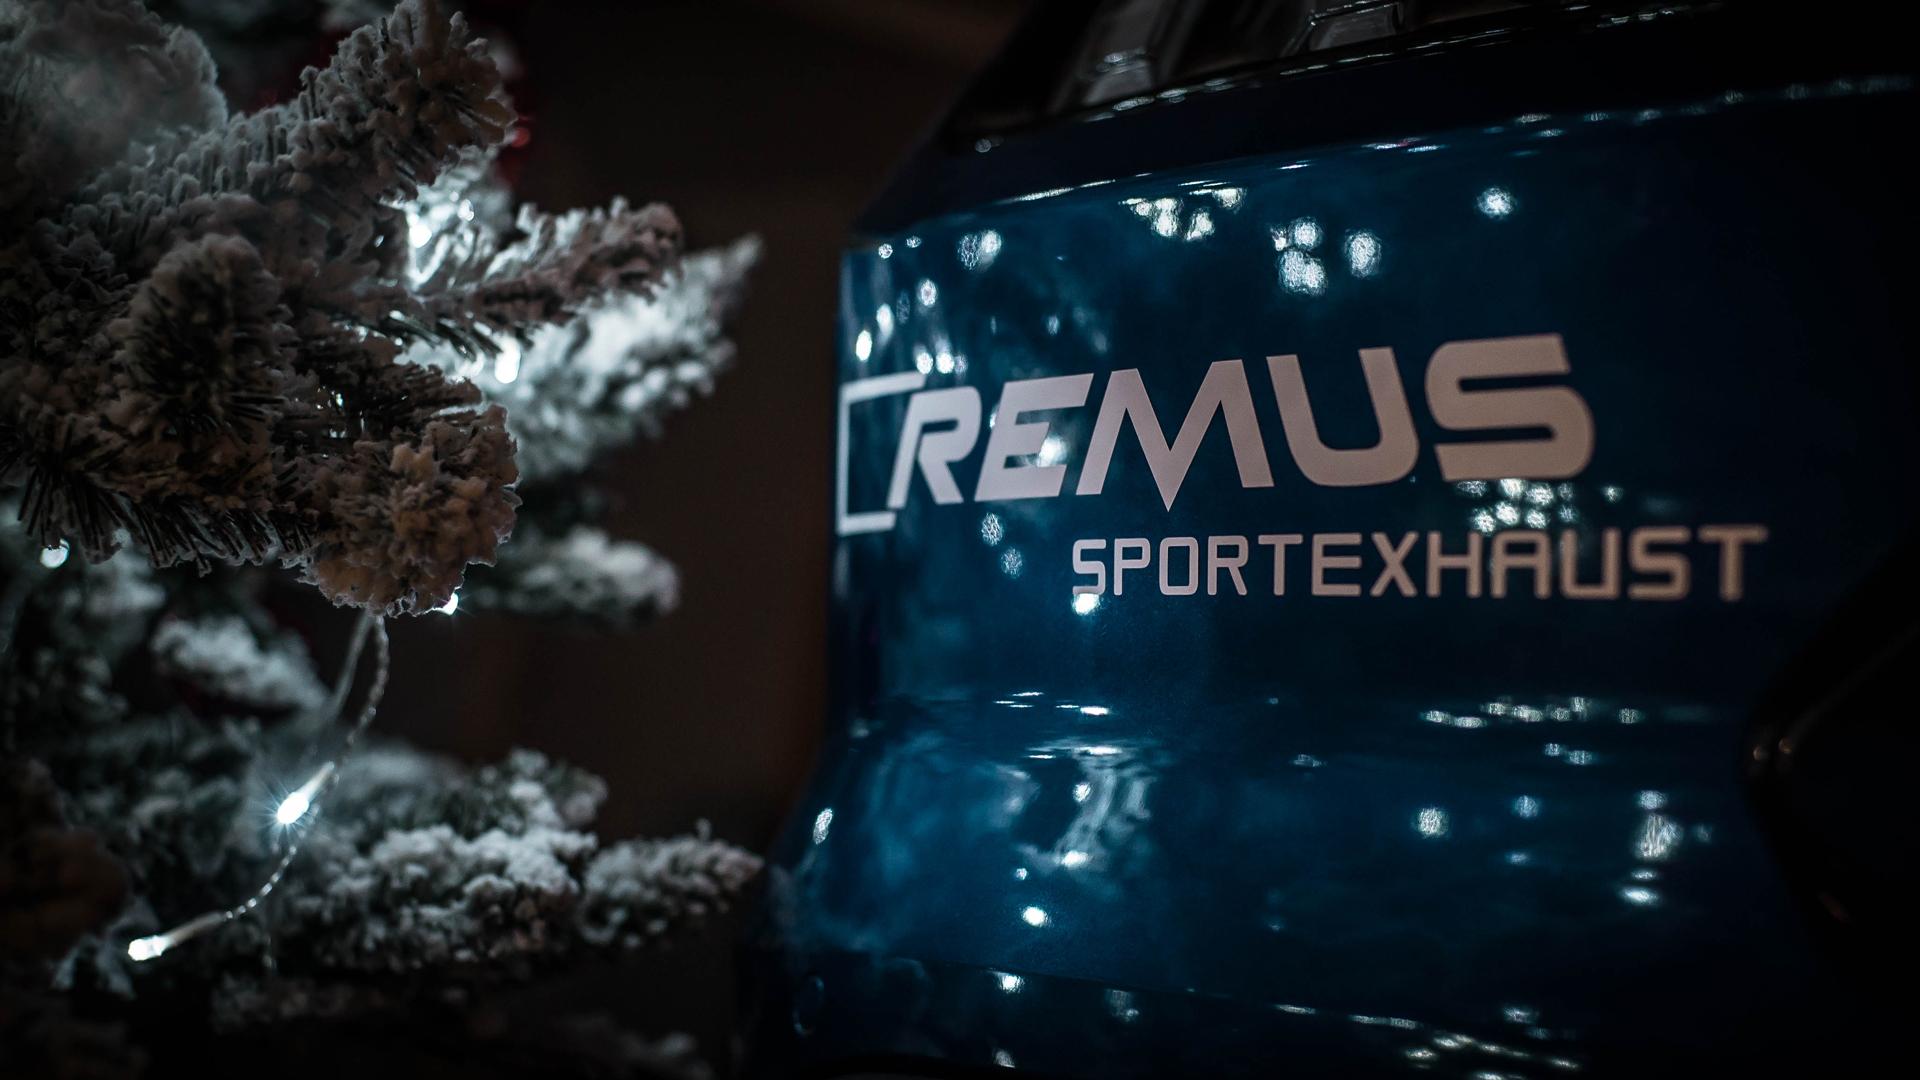 REMUS advent calendar 2018